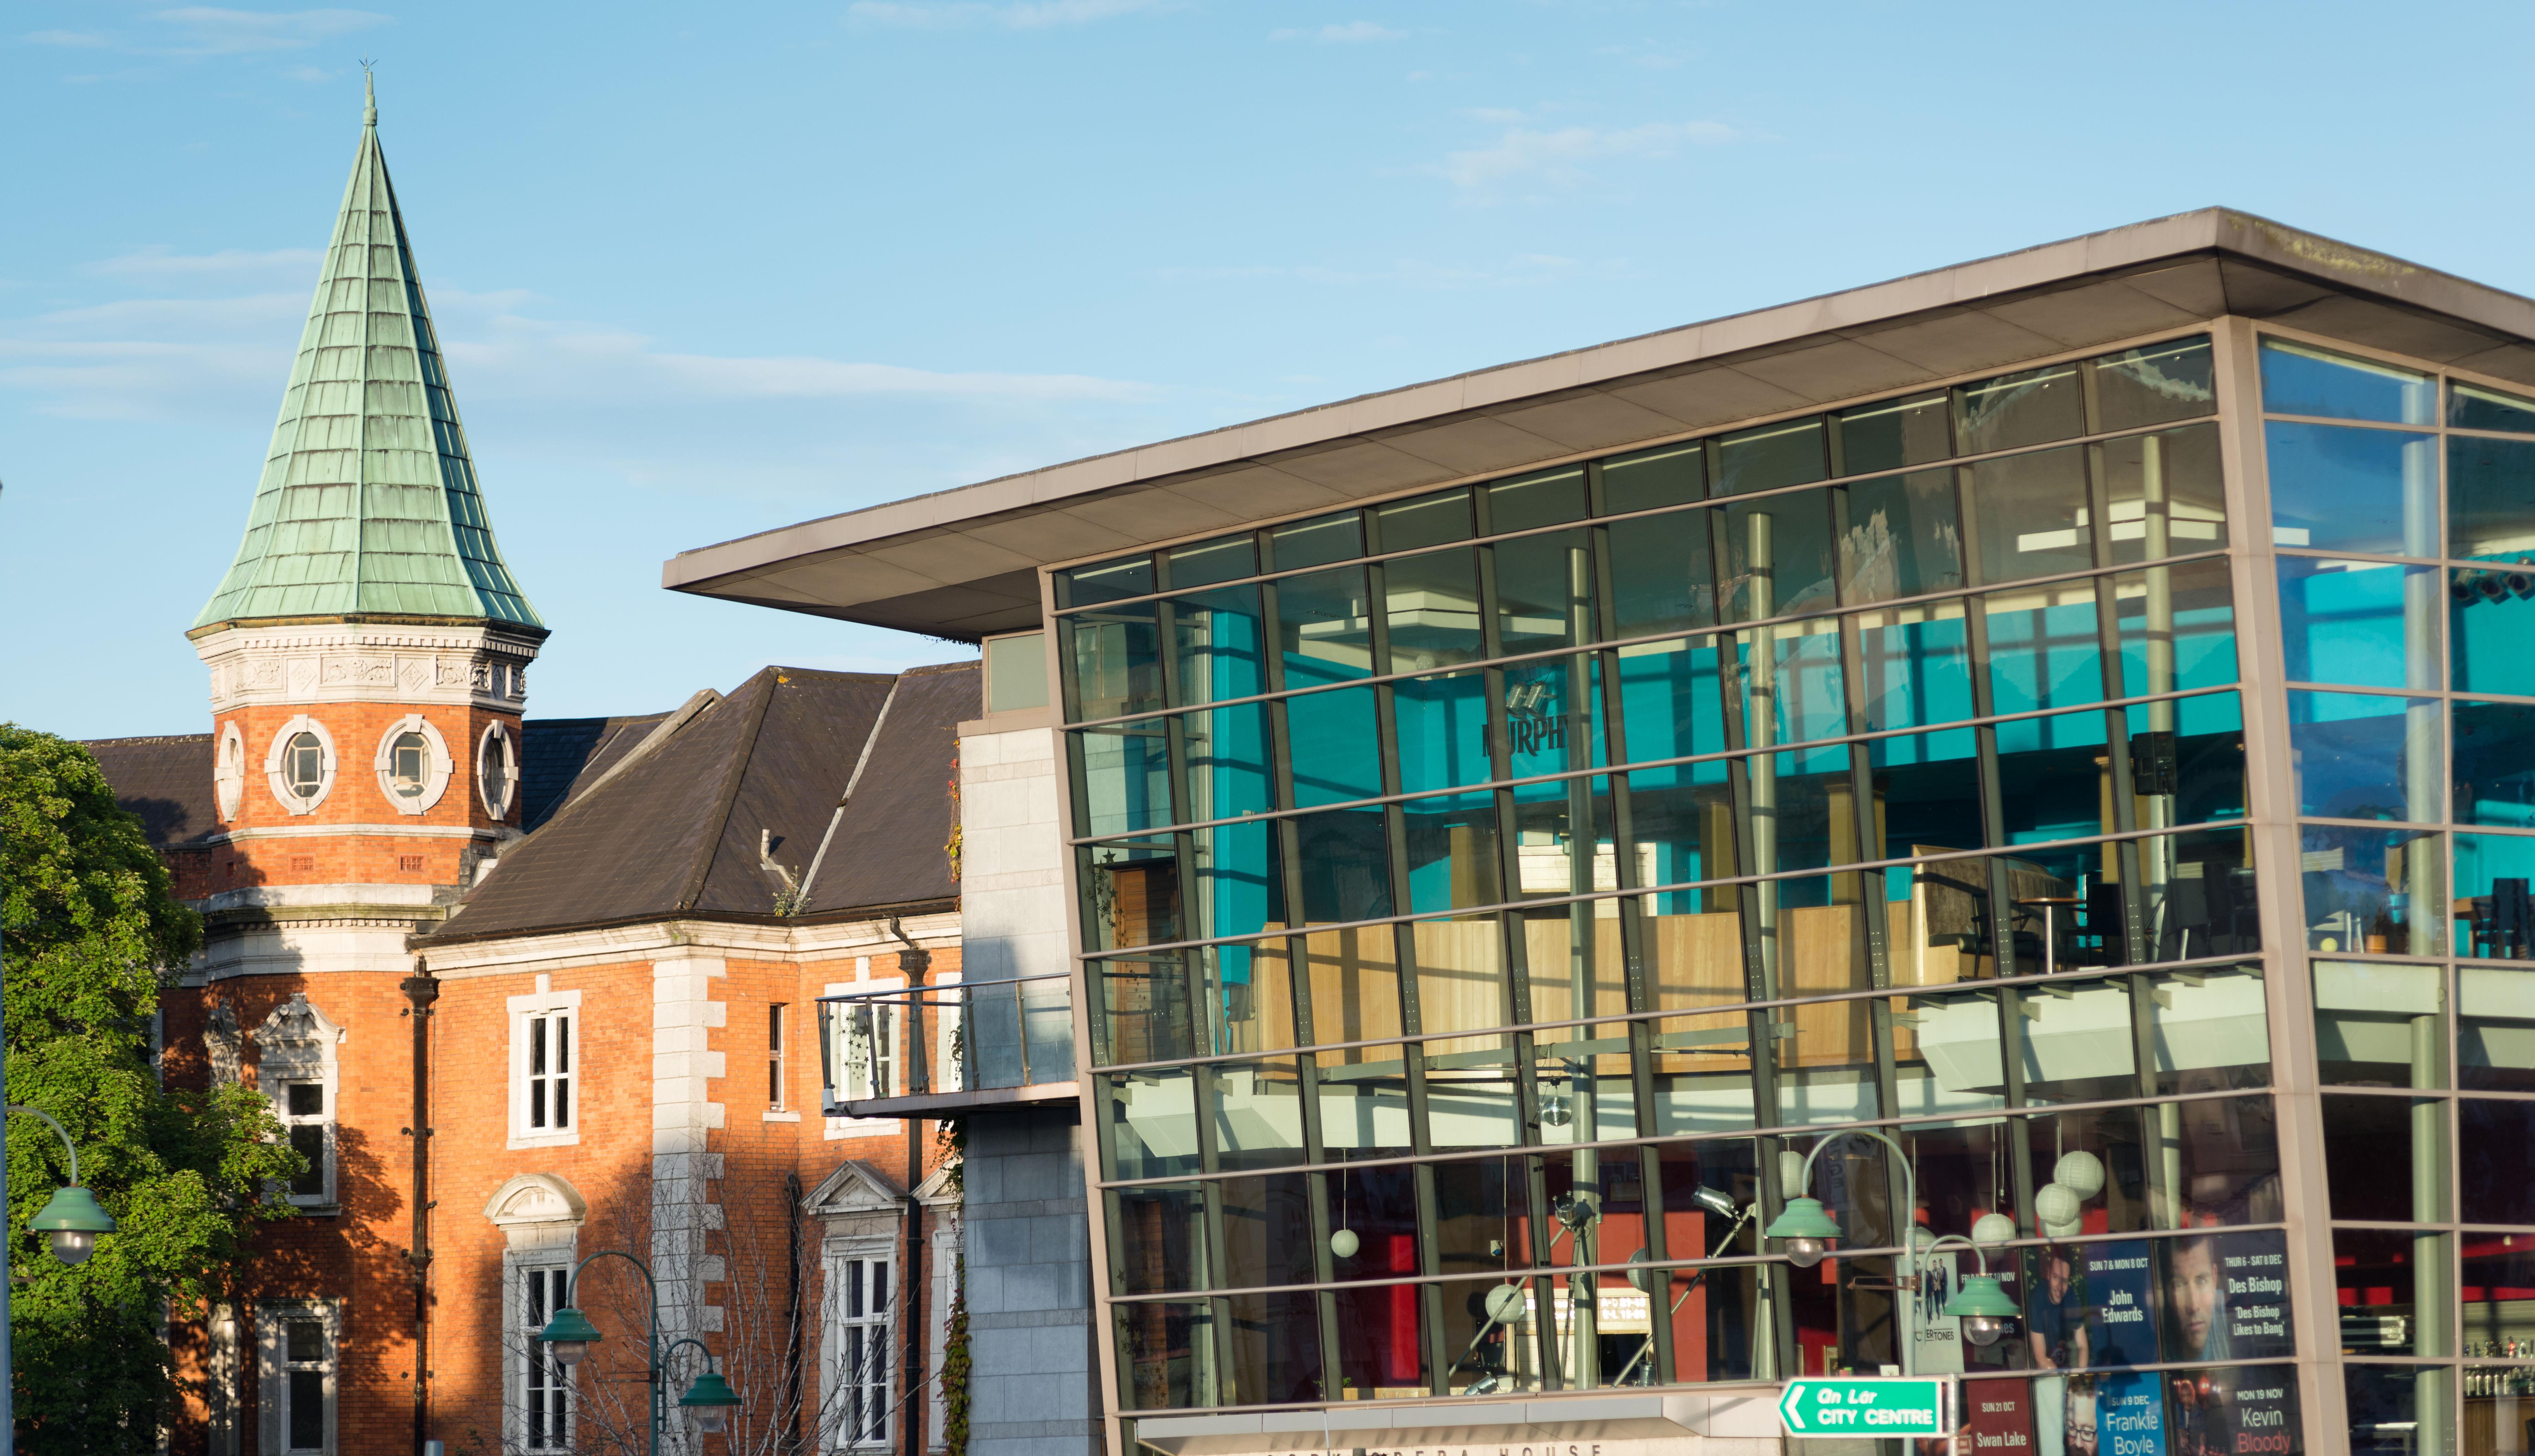 Cork Cork Opera House and Crawford Art Gallery, Cork City, Ireland